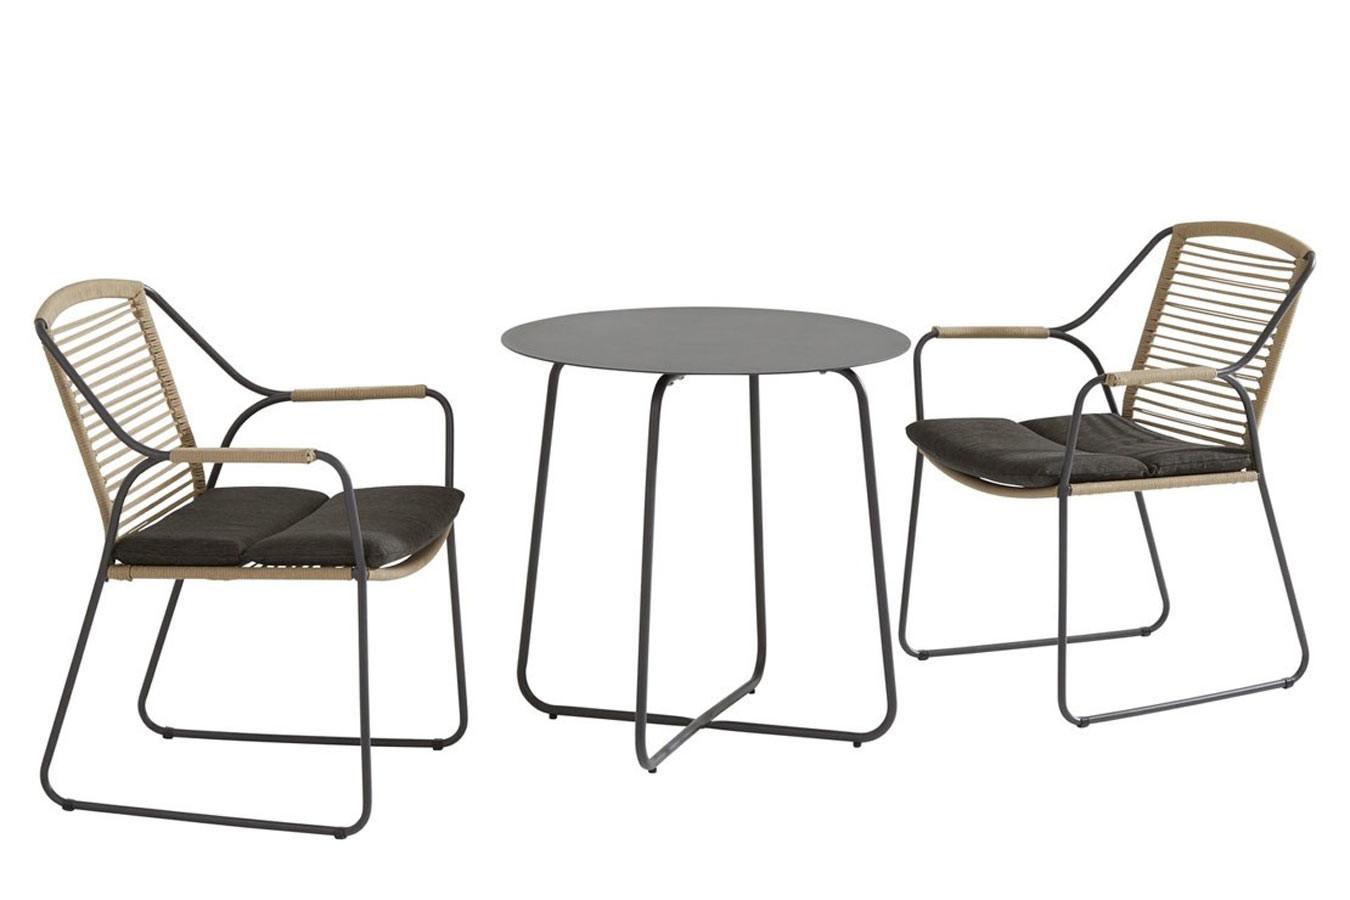 Dali anthracite bijzet tafel met 2 Scandic dining stoelen